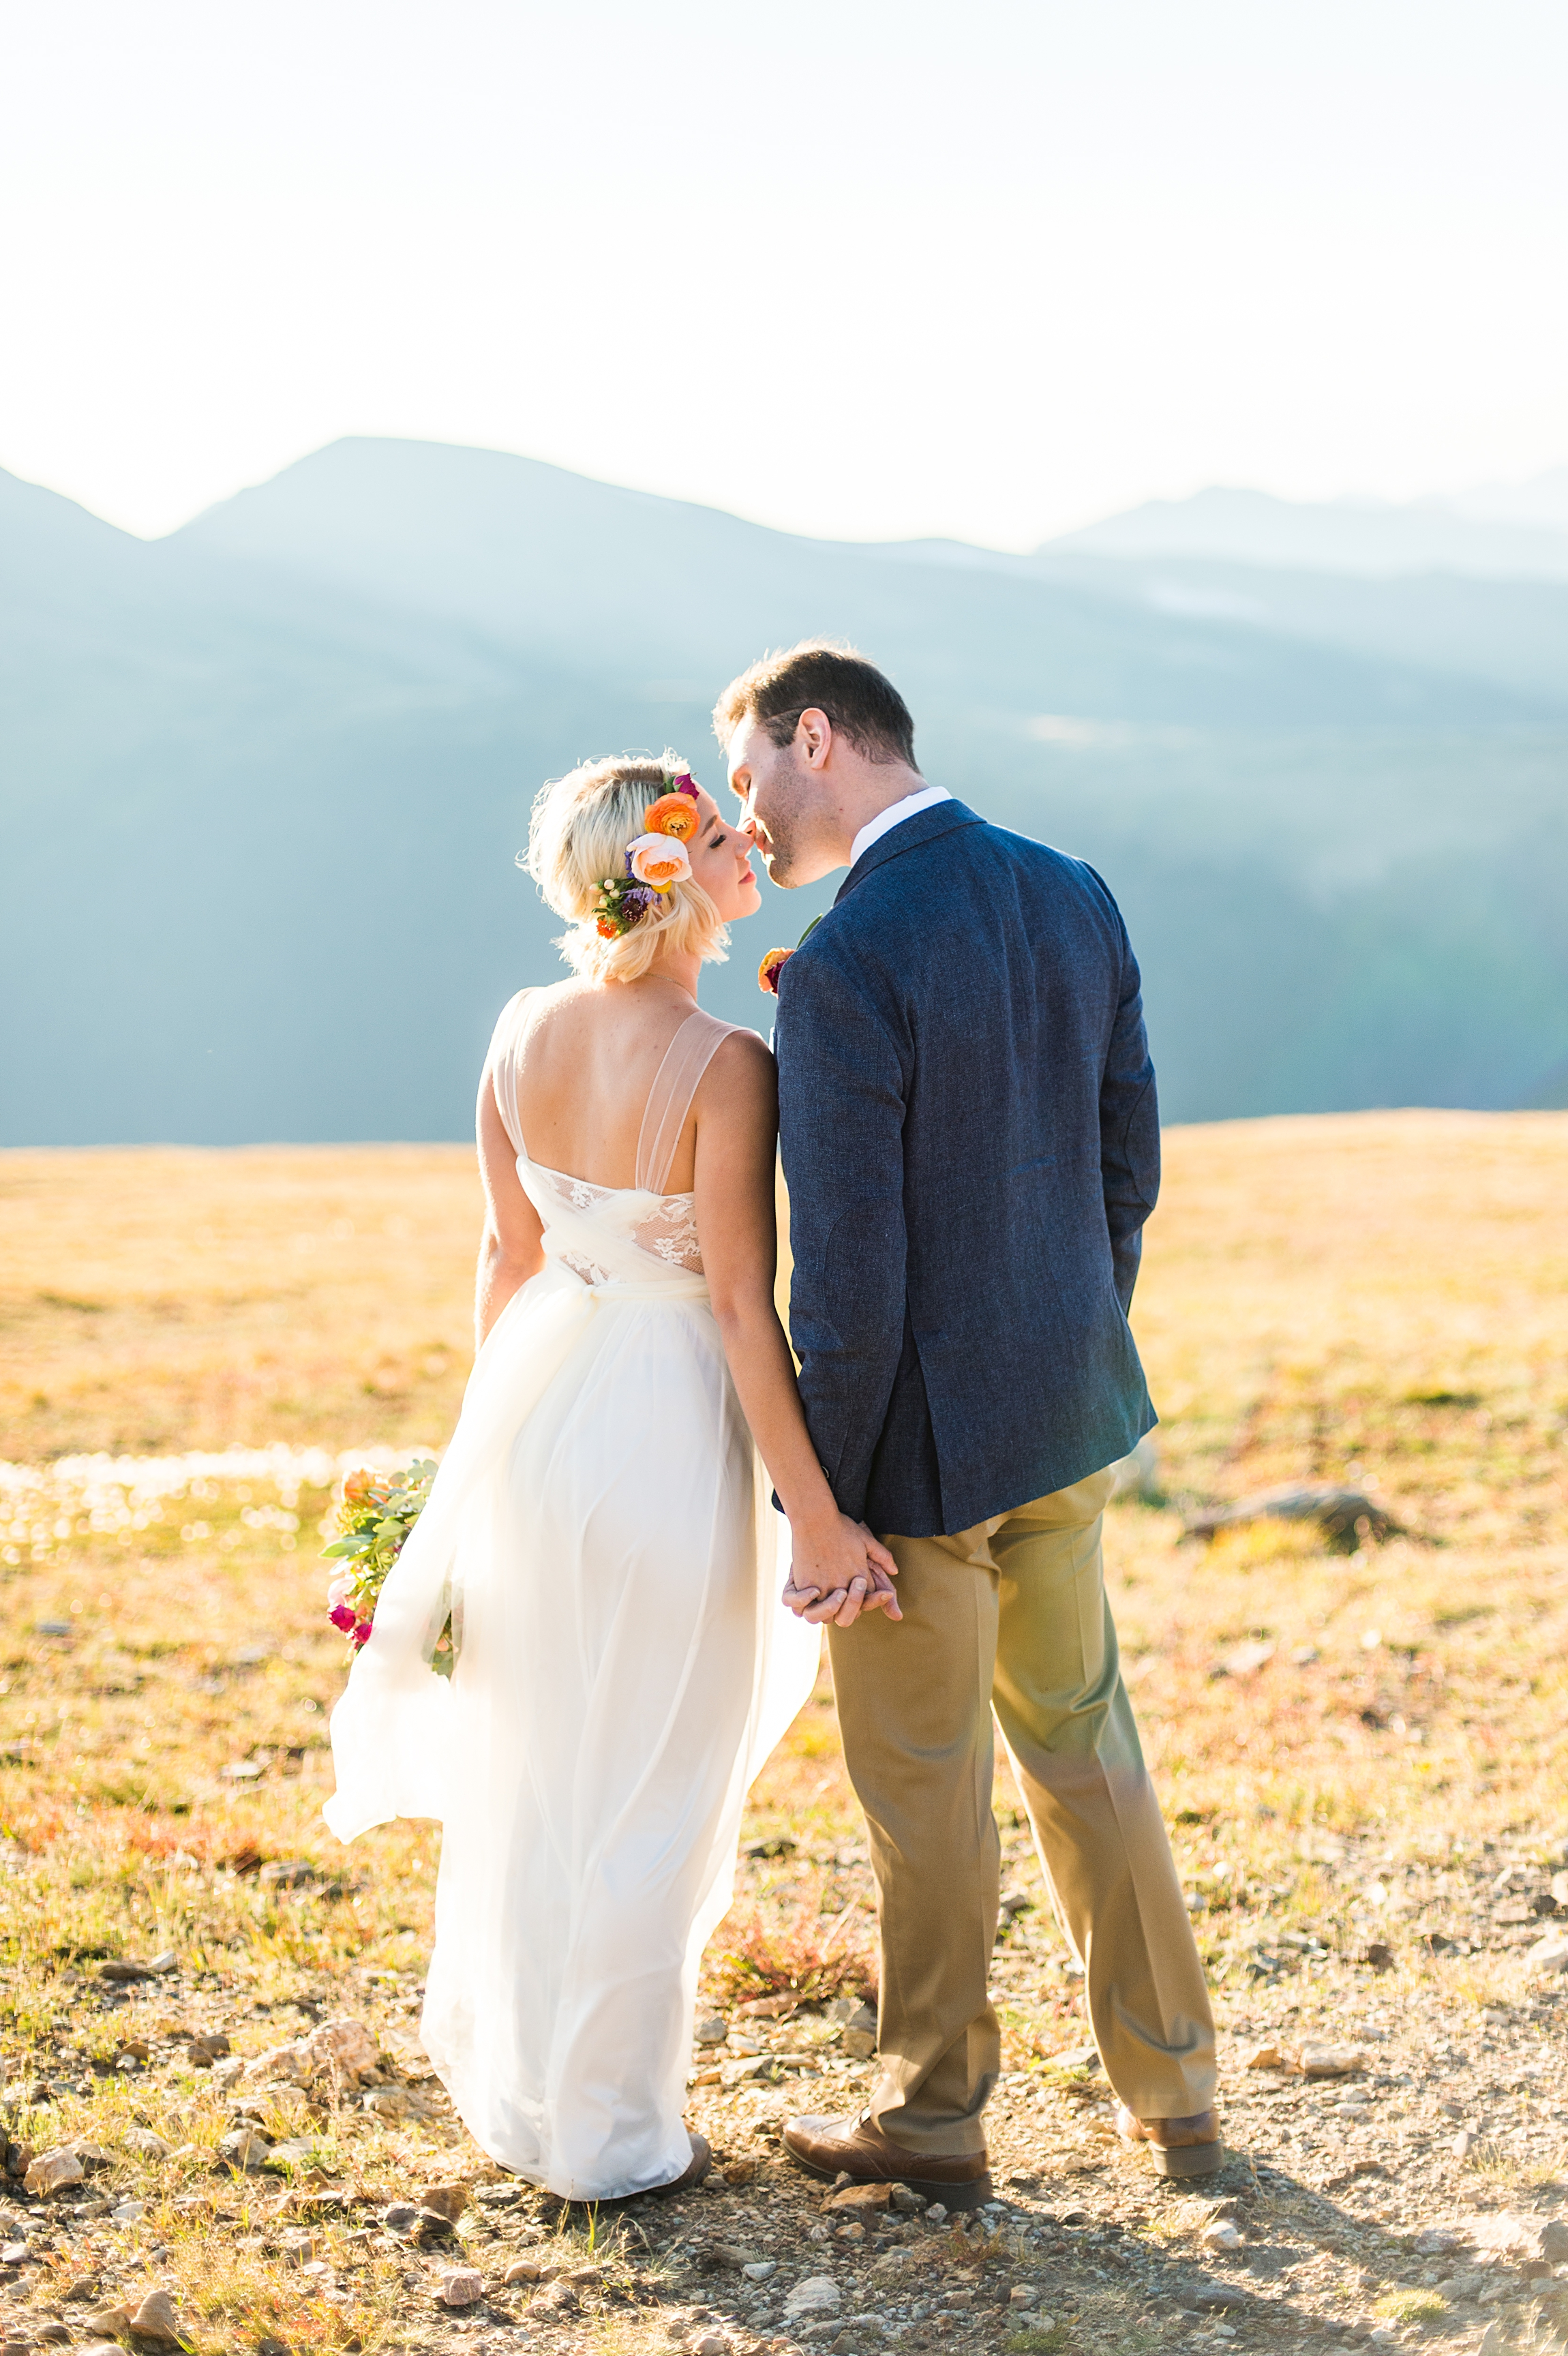 20160821-rocky-mountain-park-wedding_0025